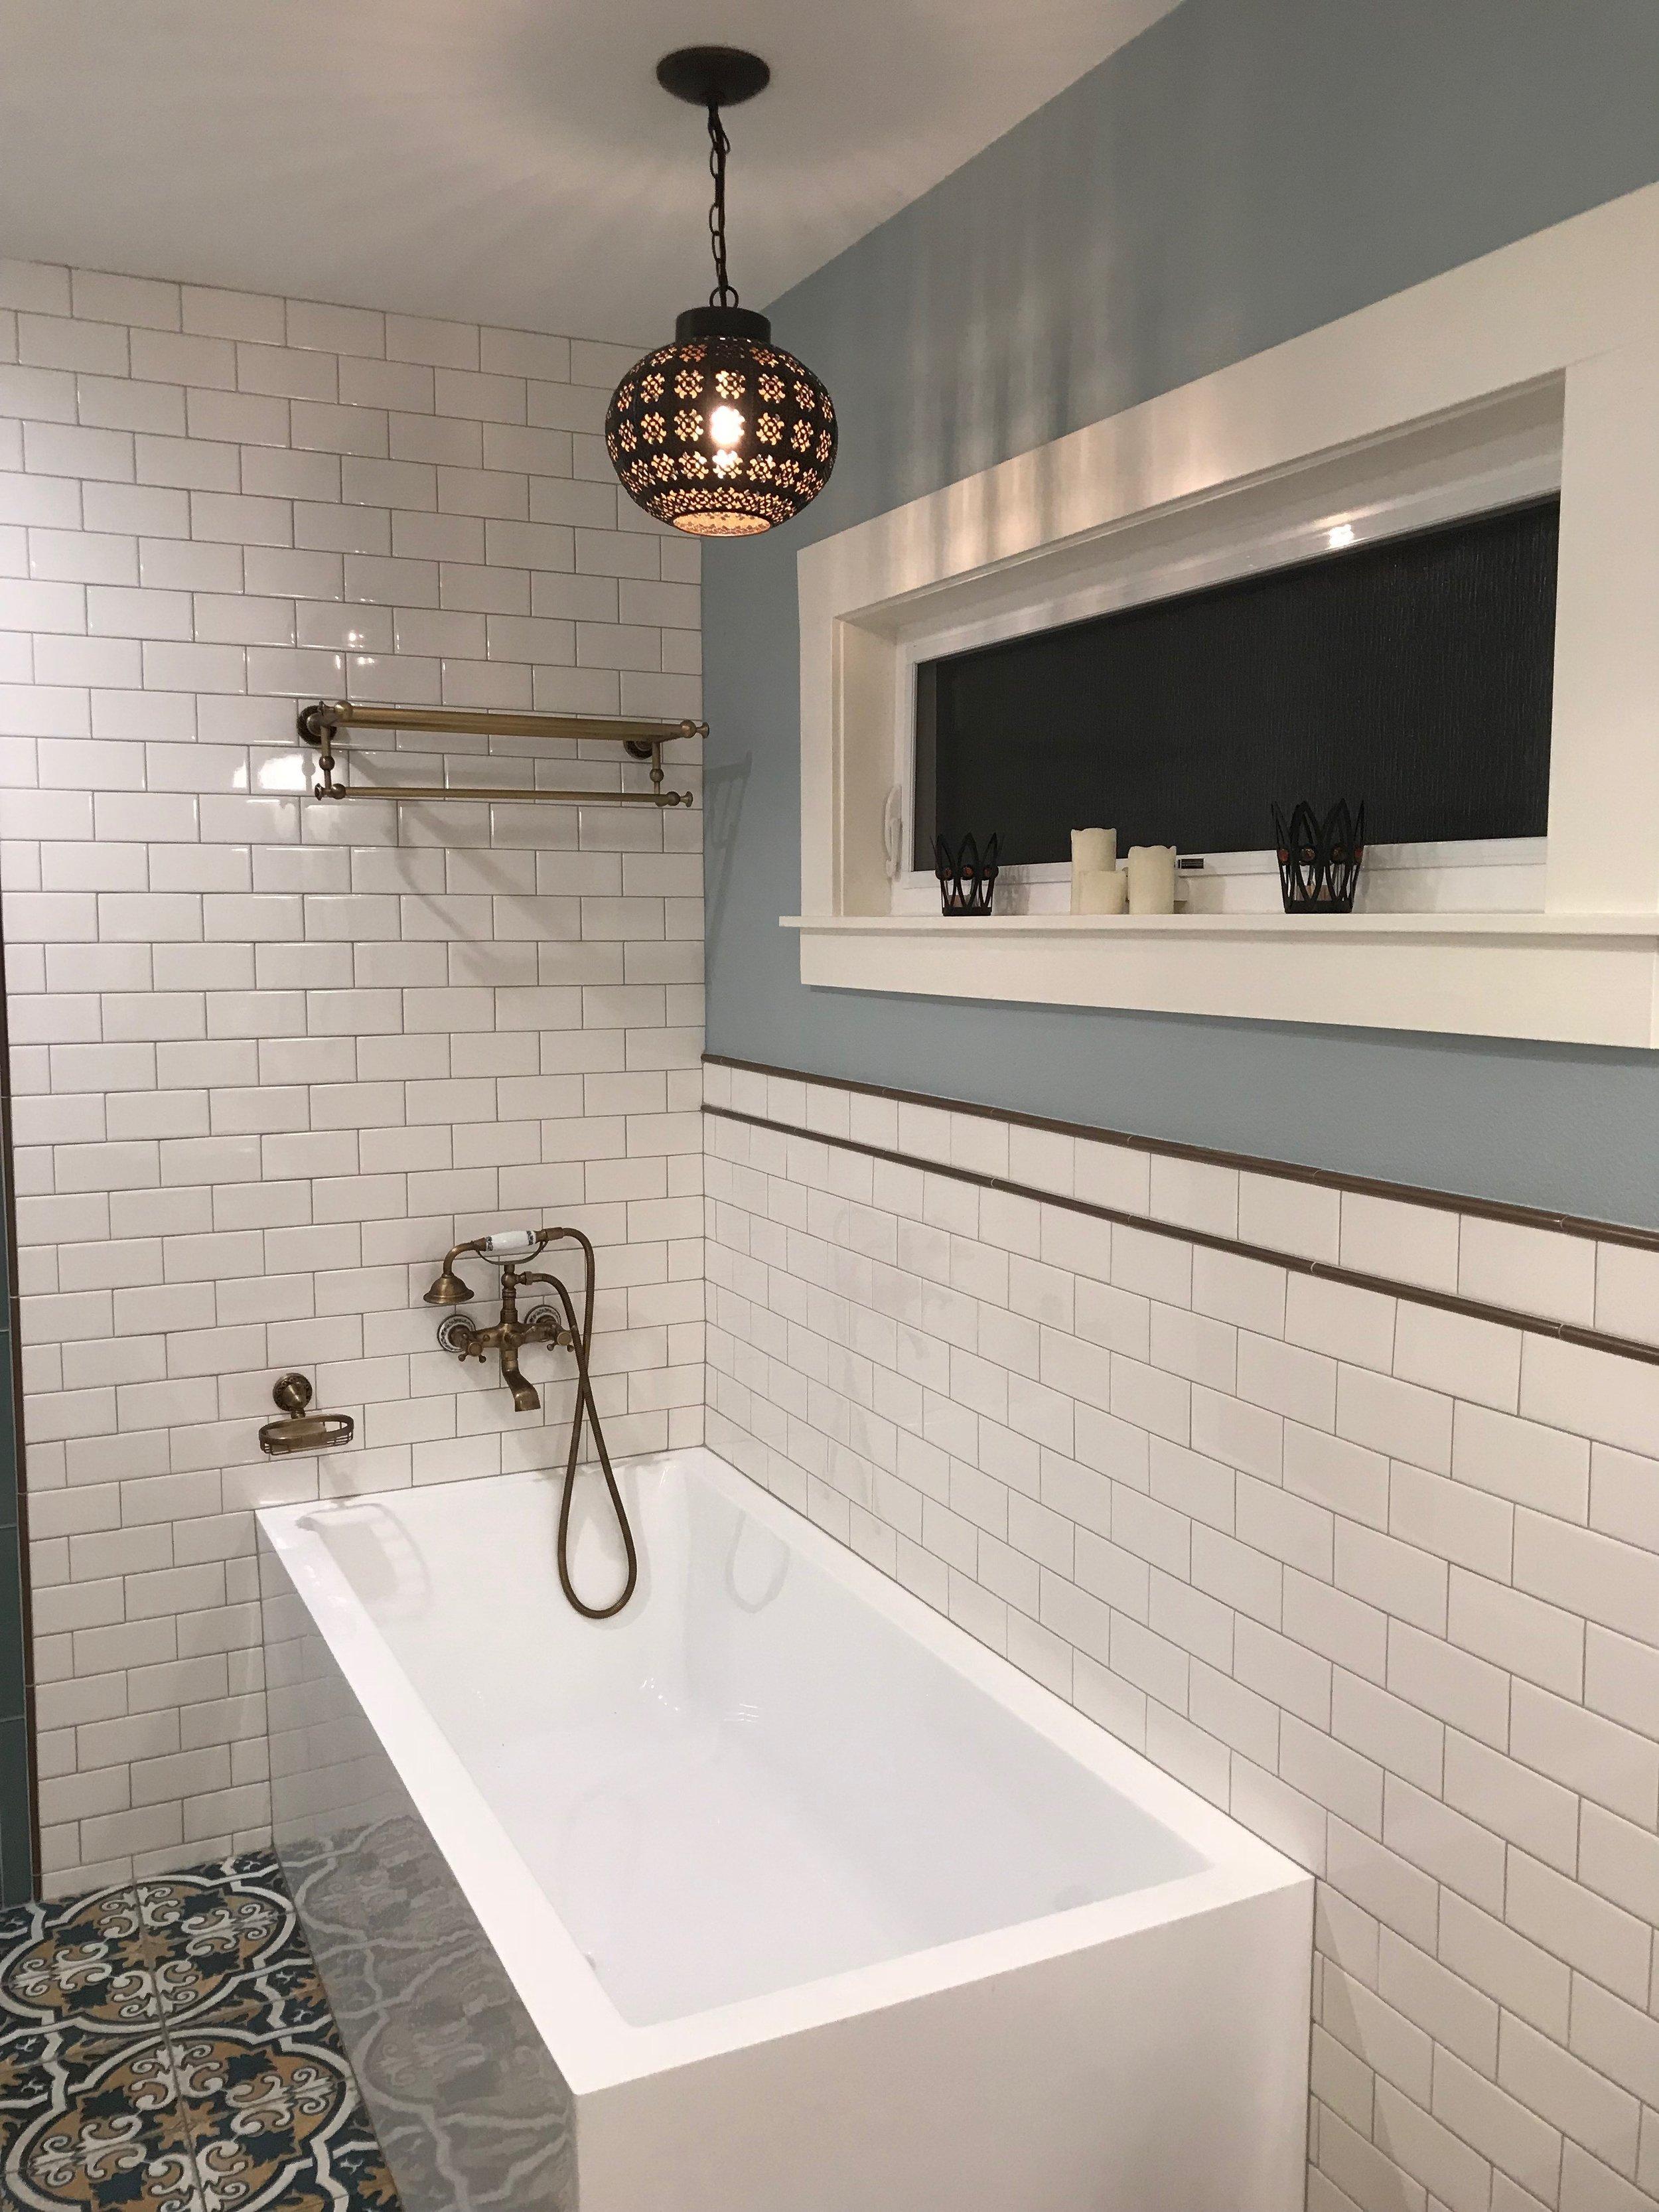 Batista Residence Bath 1.jpeg